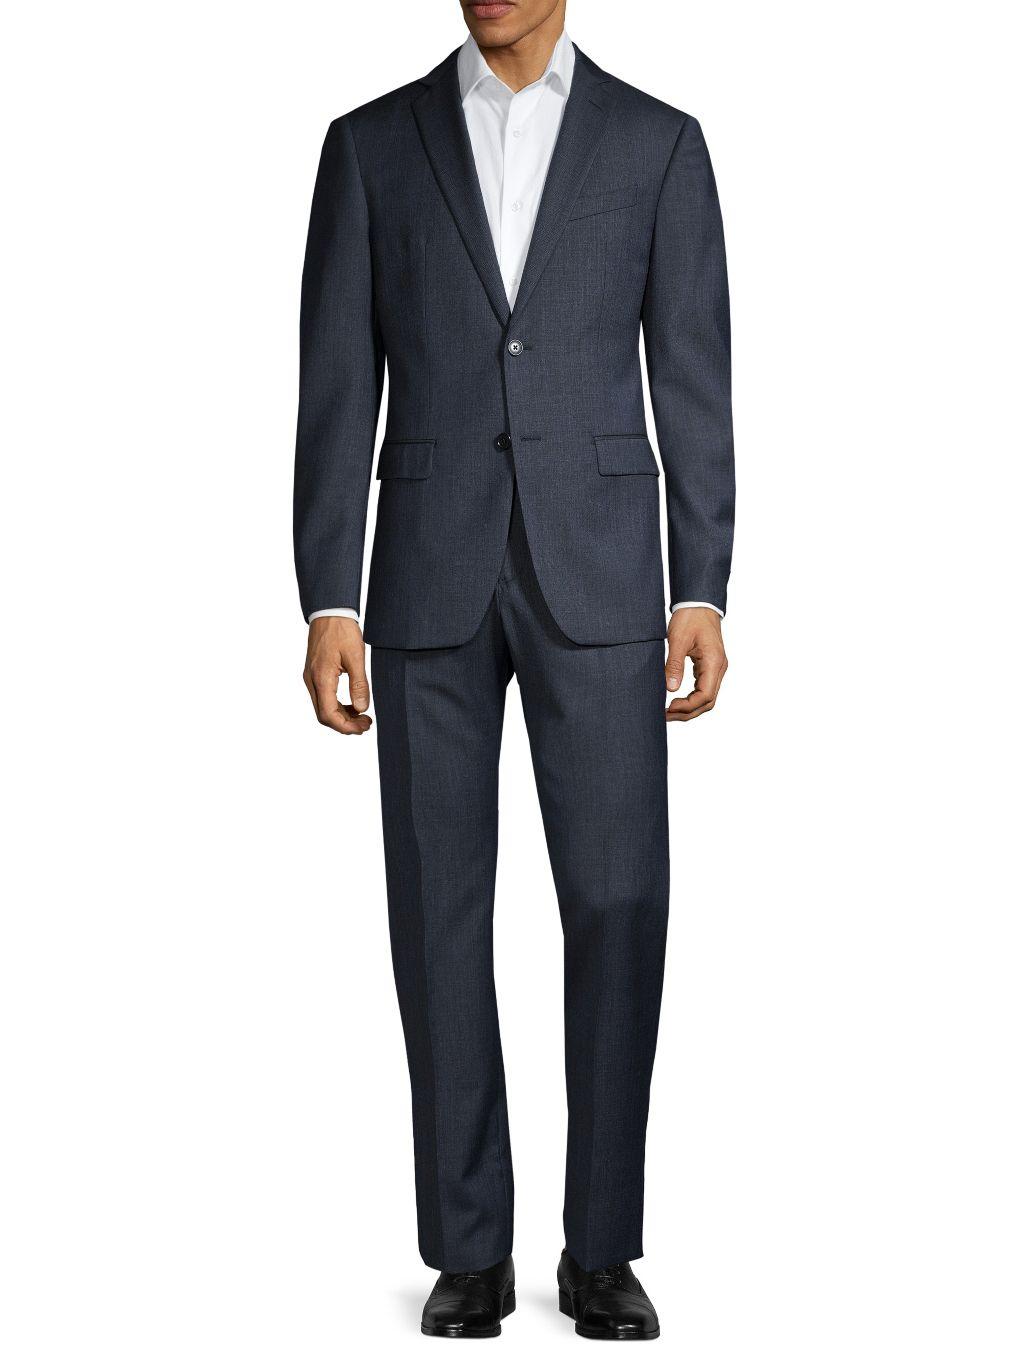 John Varvatos Star U.S.A. Standard-Fit Wool Suit